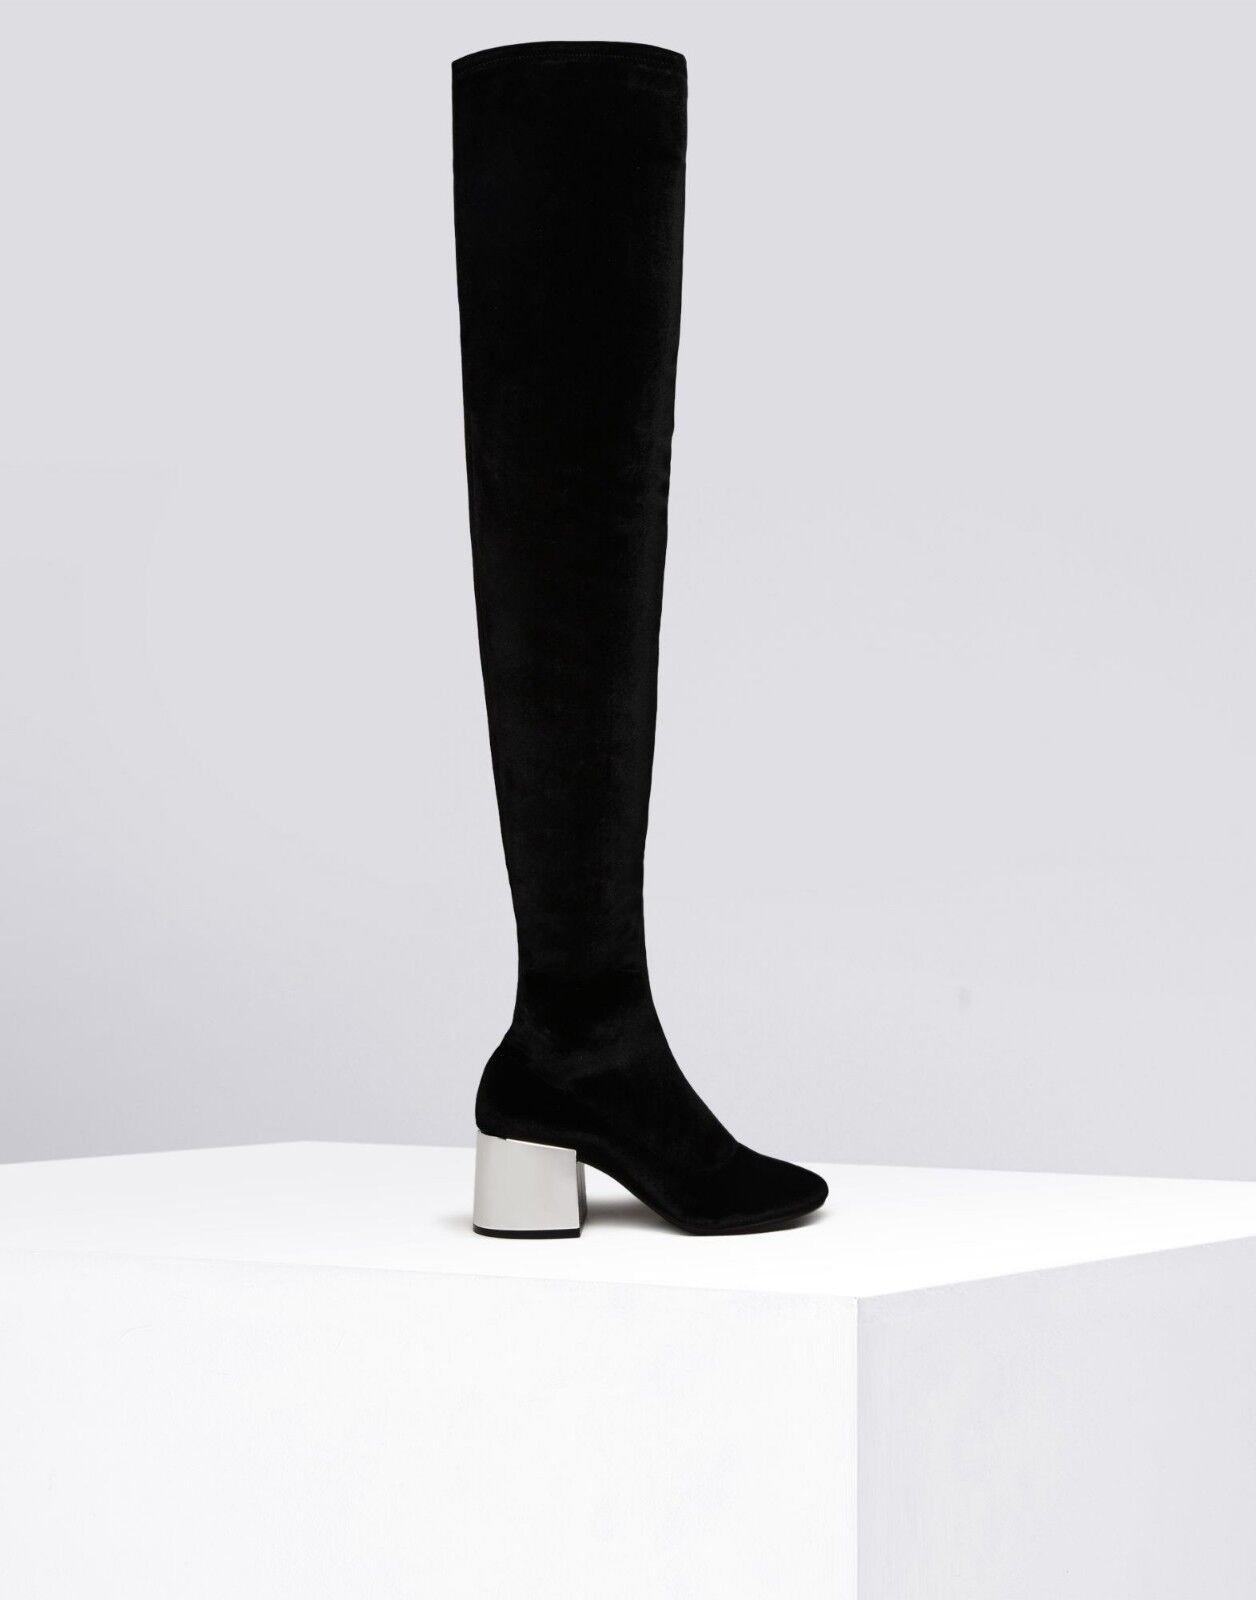 MM6 Maison Margiela Womens Stretch Velvet Over-the-knee Black Boots Size EU 40